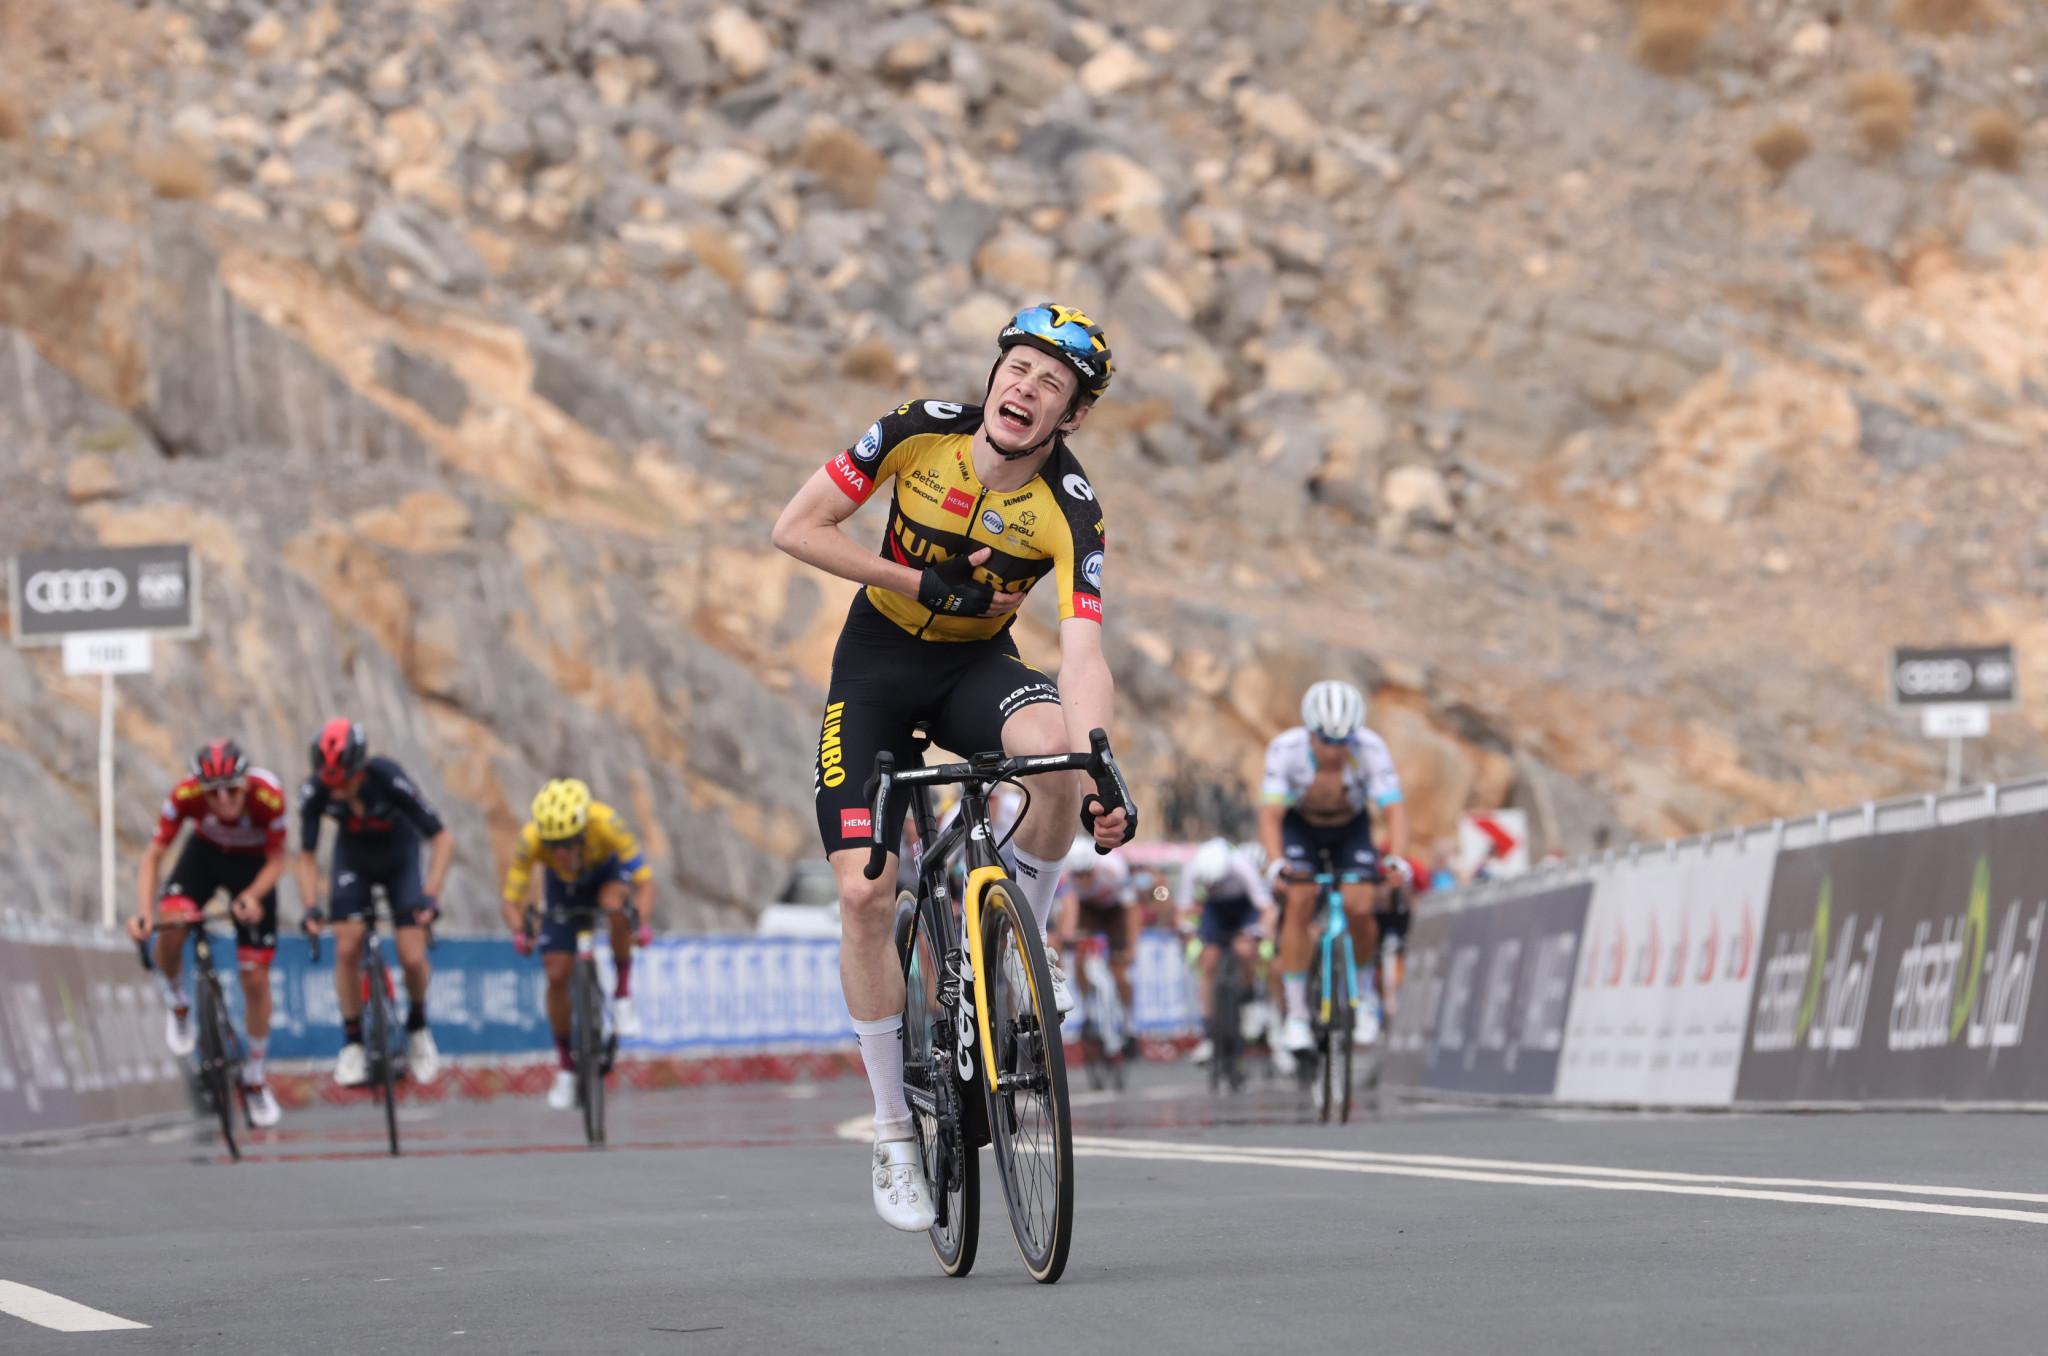 Vingegaard wins stage five of UAE Tour as Pogacar retains race lead